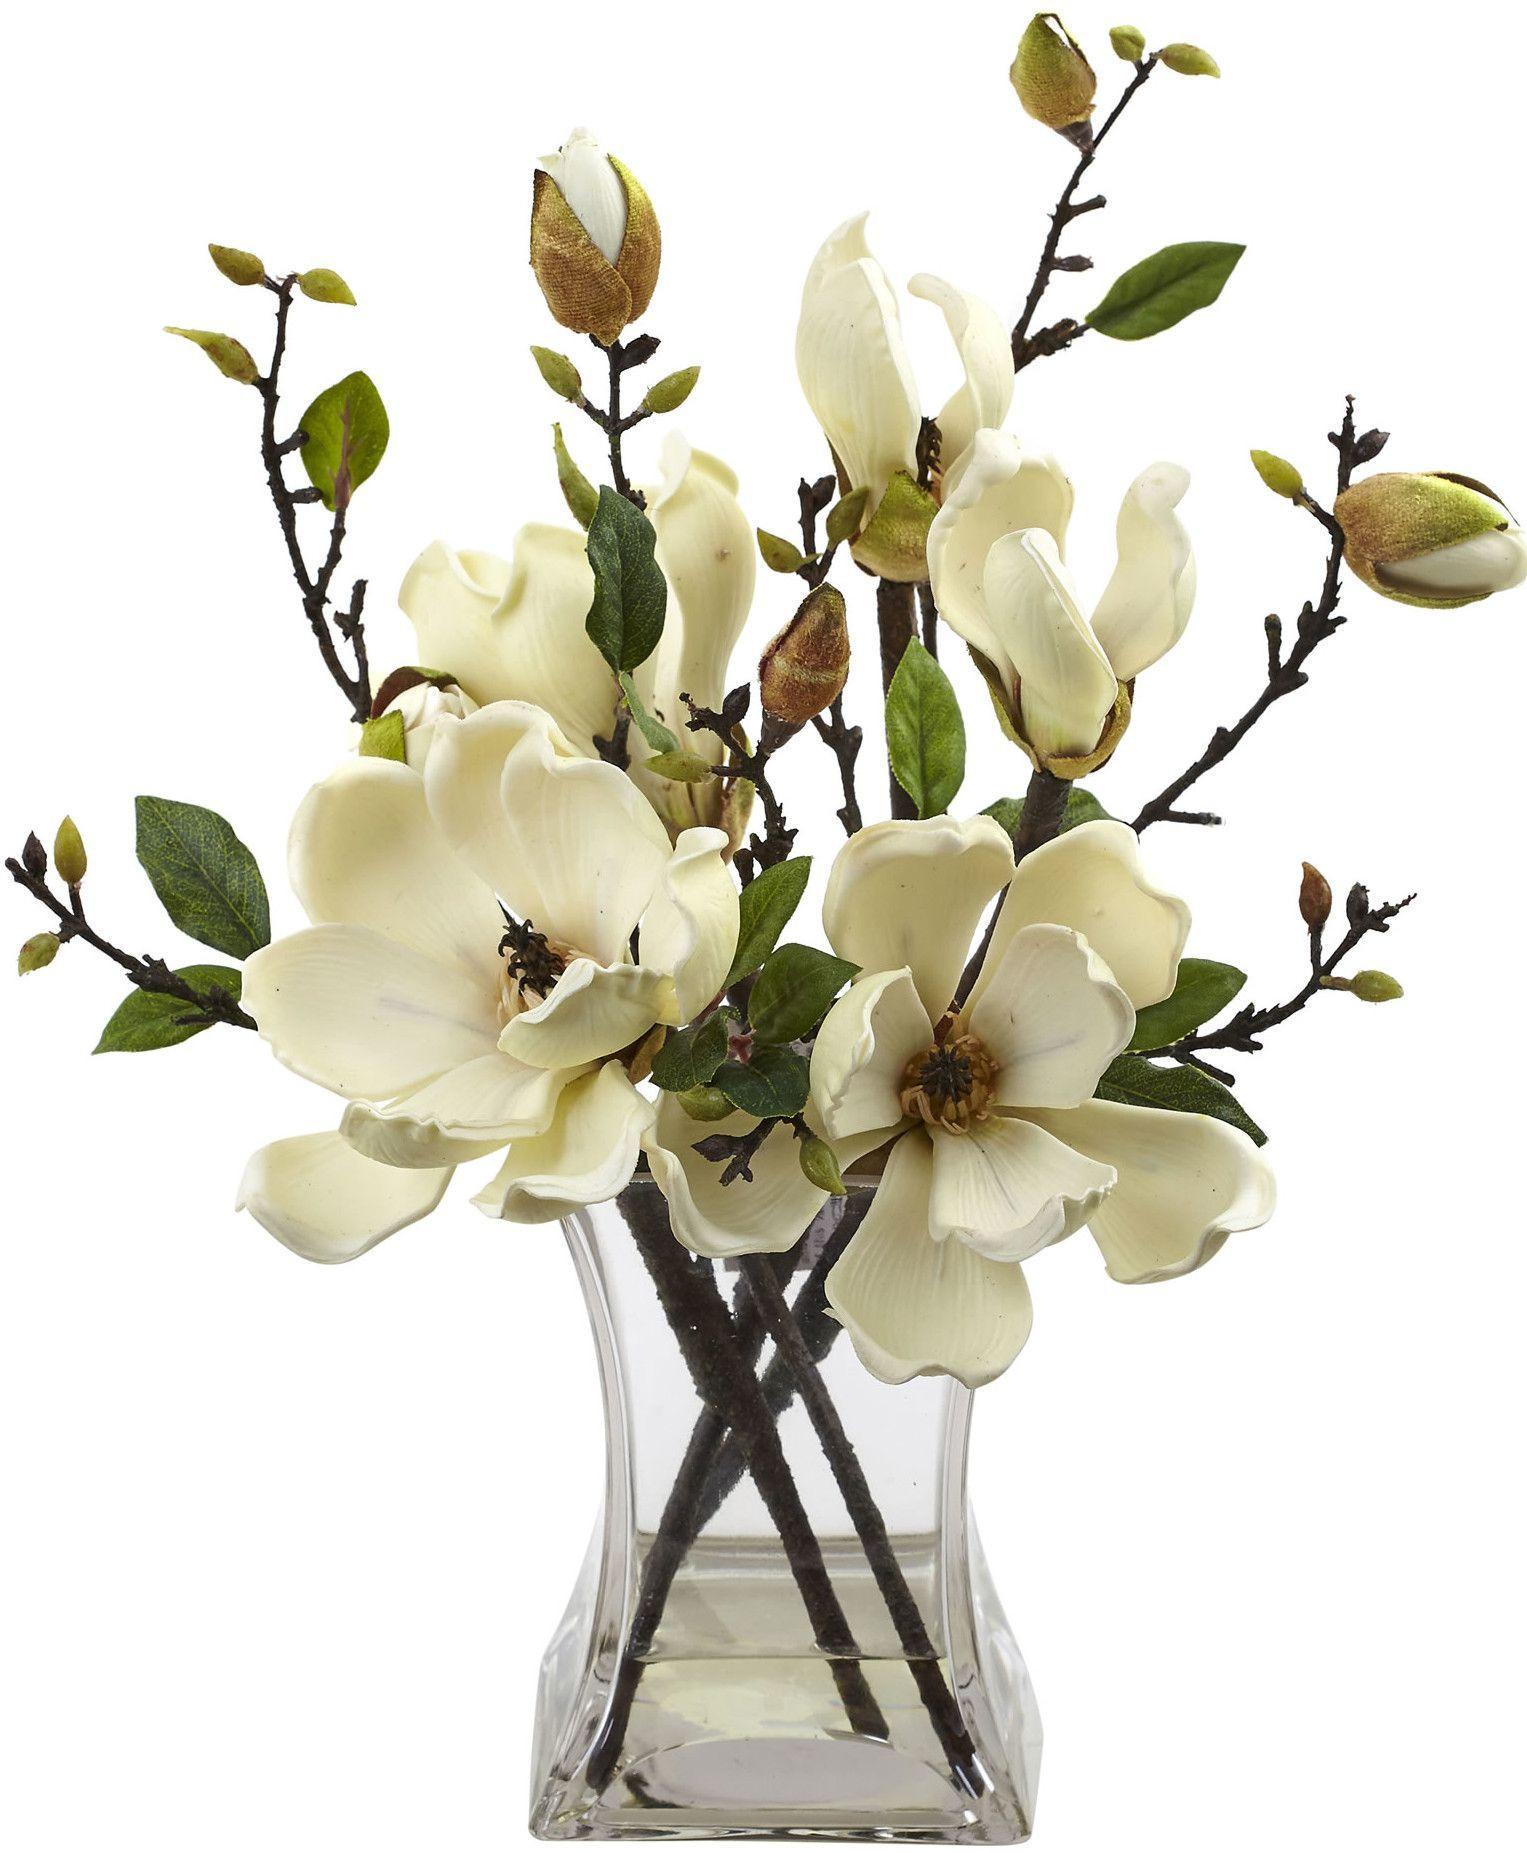 19 Lovely Debi Lilly Design Illusion Vases 2021 free download debi lilly design illusion vases of magnolia arrangement with vase magnolias pinterest flowers inside magnolia arrangement with vase